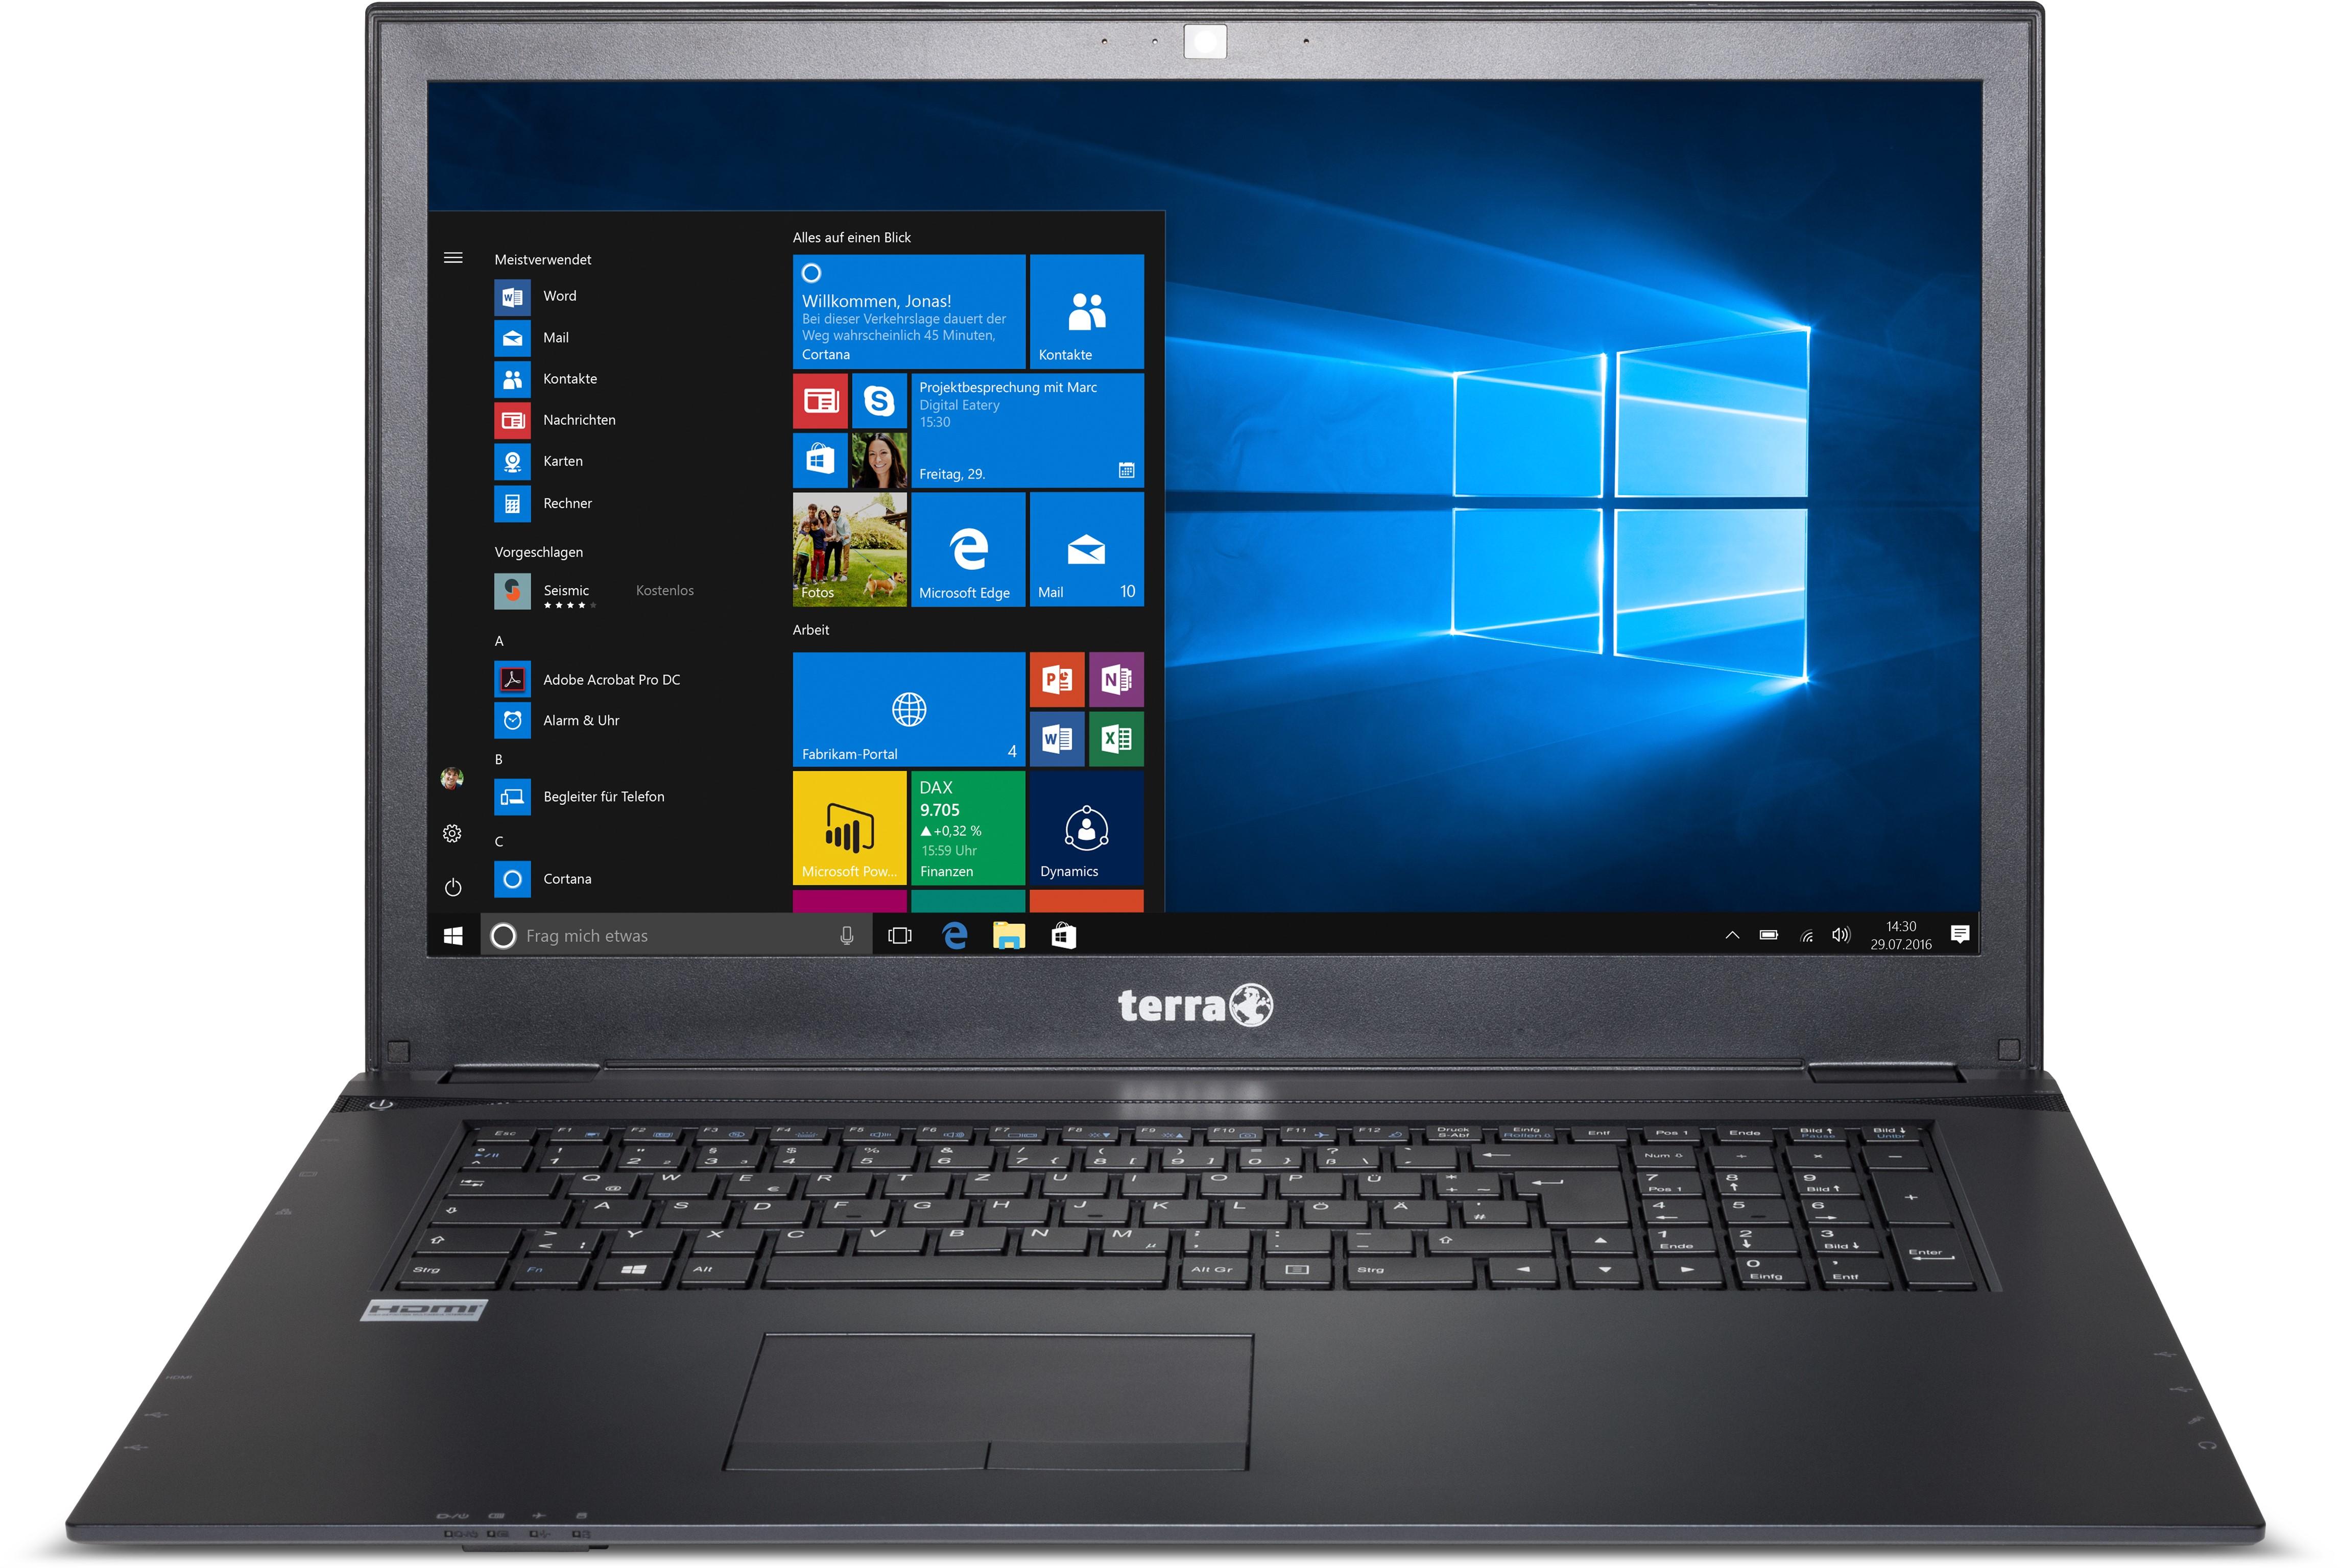 f8448c7414 PC Portable Terra Mobile 1715 i5-7200U Windows 10 Professionnel ...